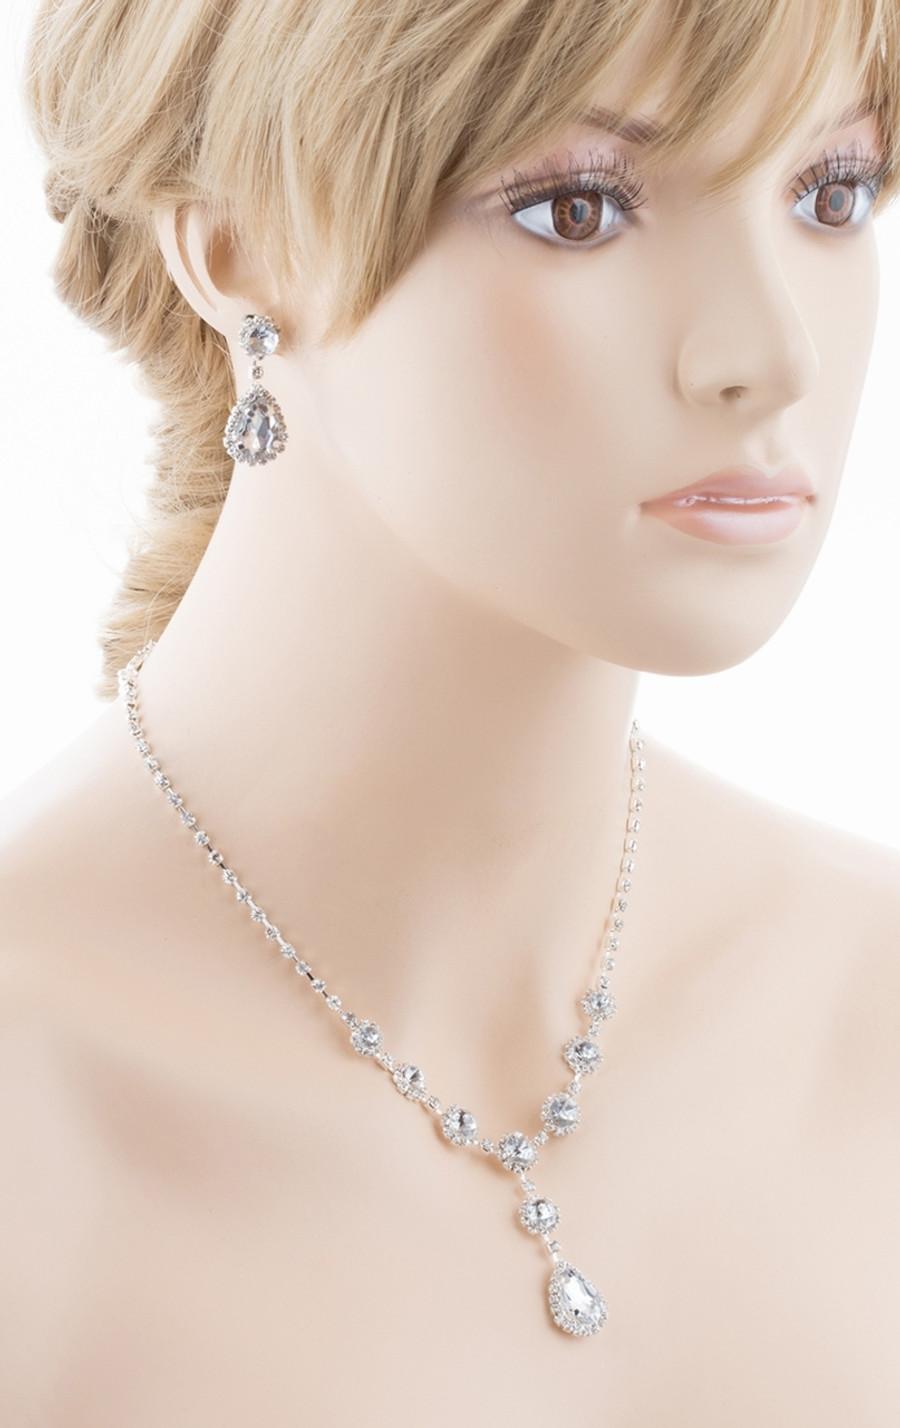 Bridal Wedding Jewelry Crystal Rhinestone Prom Necklace Earrings Set J726 Silver